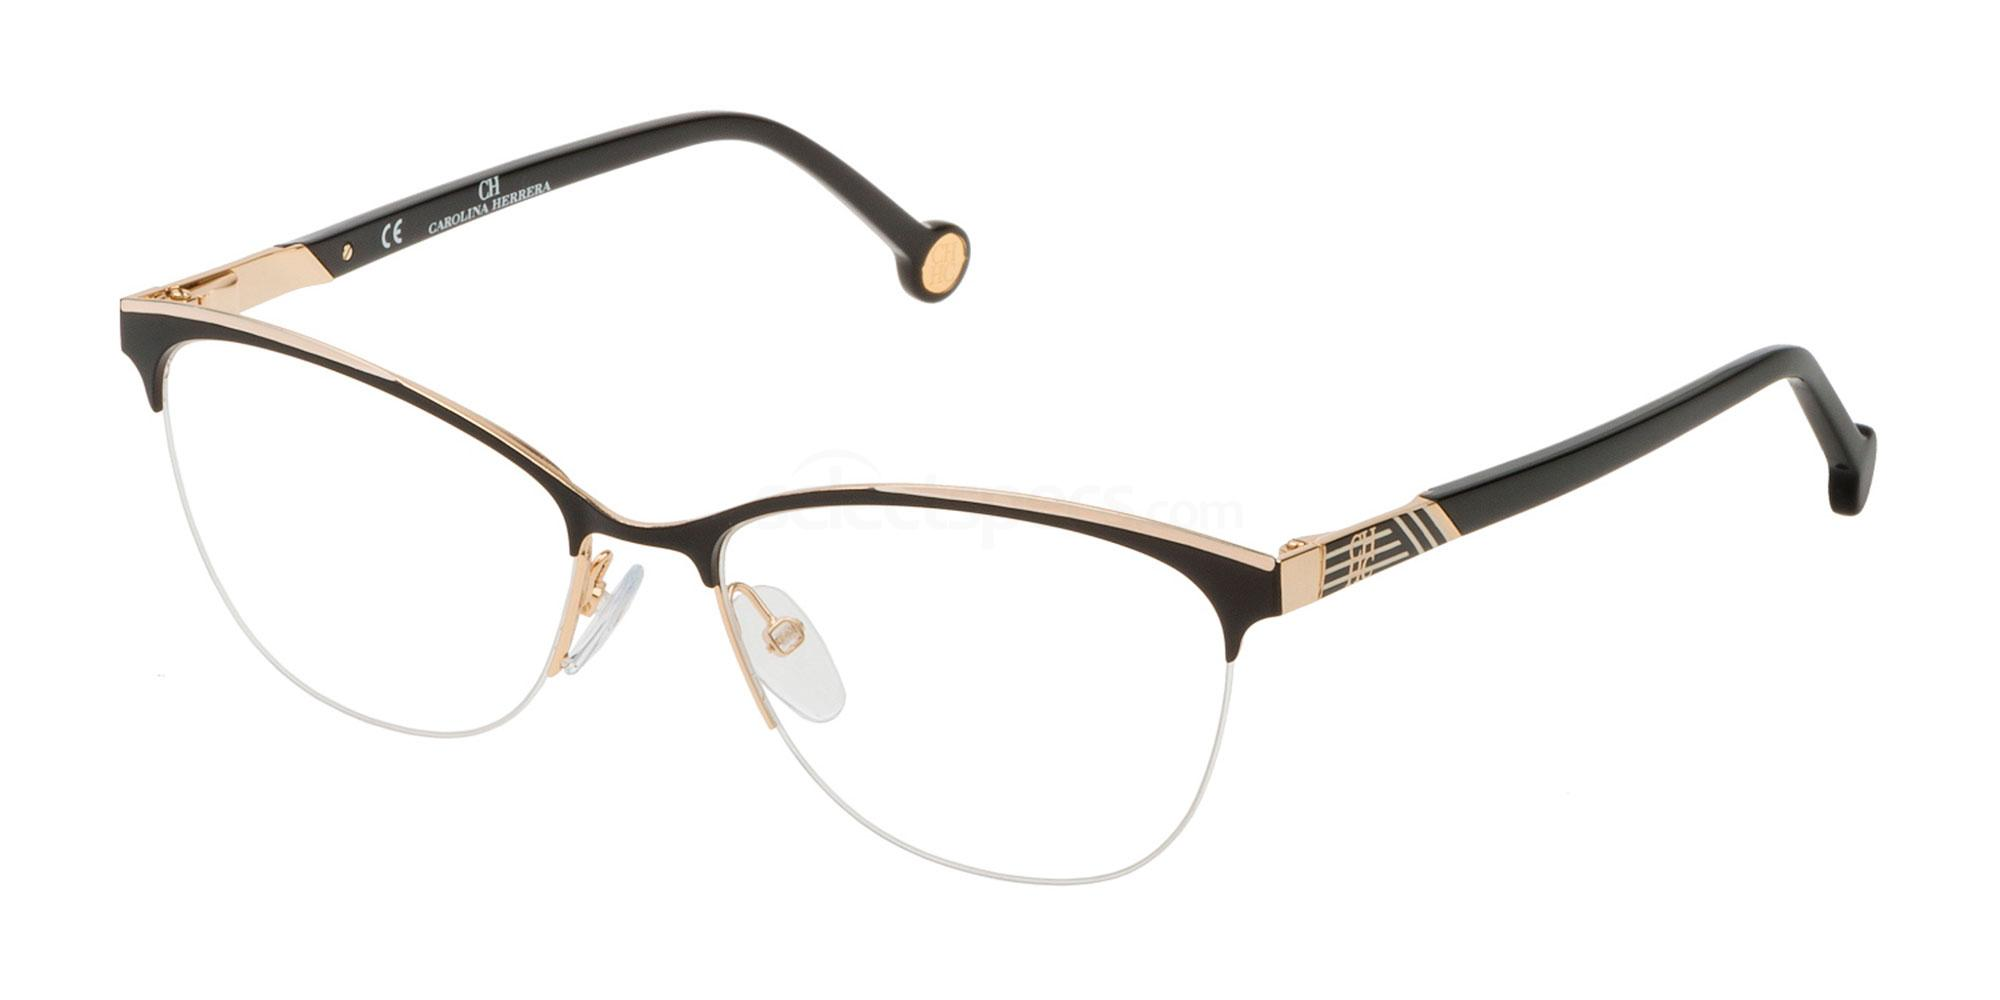 0301 VHE123 Glasses, CH Carolina Herrera